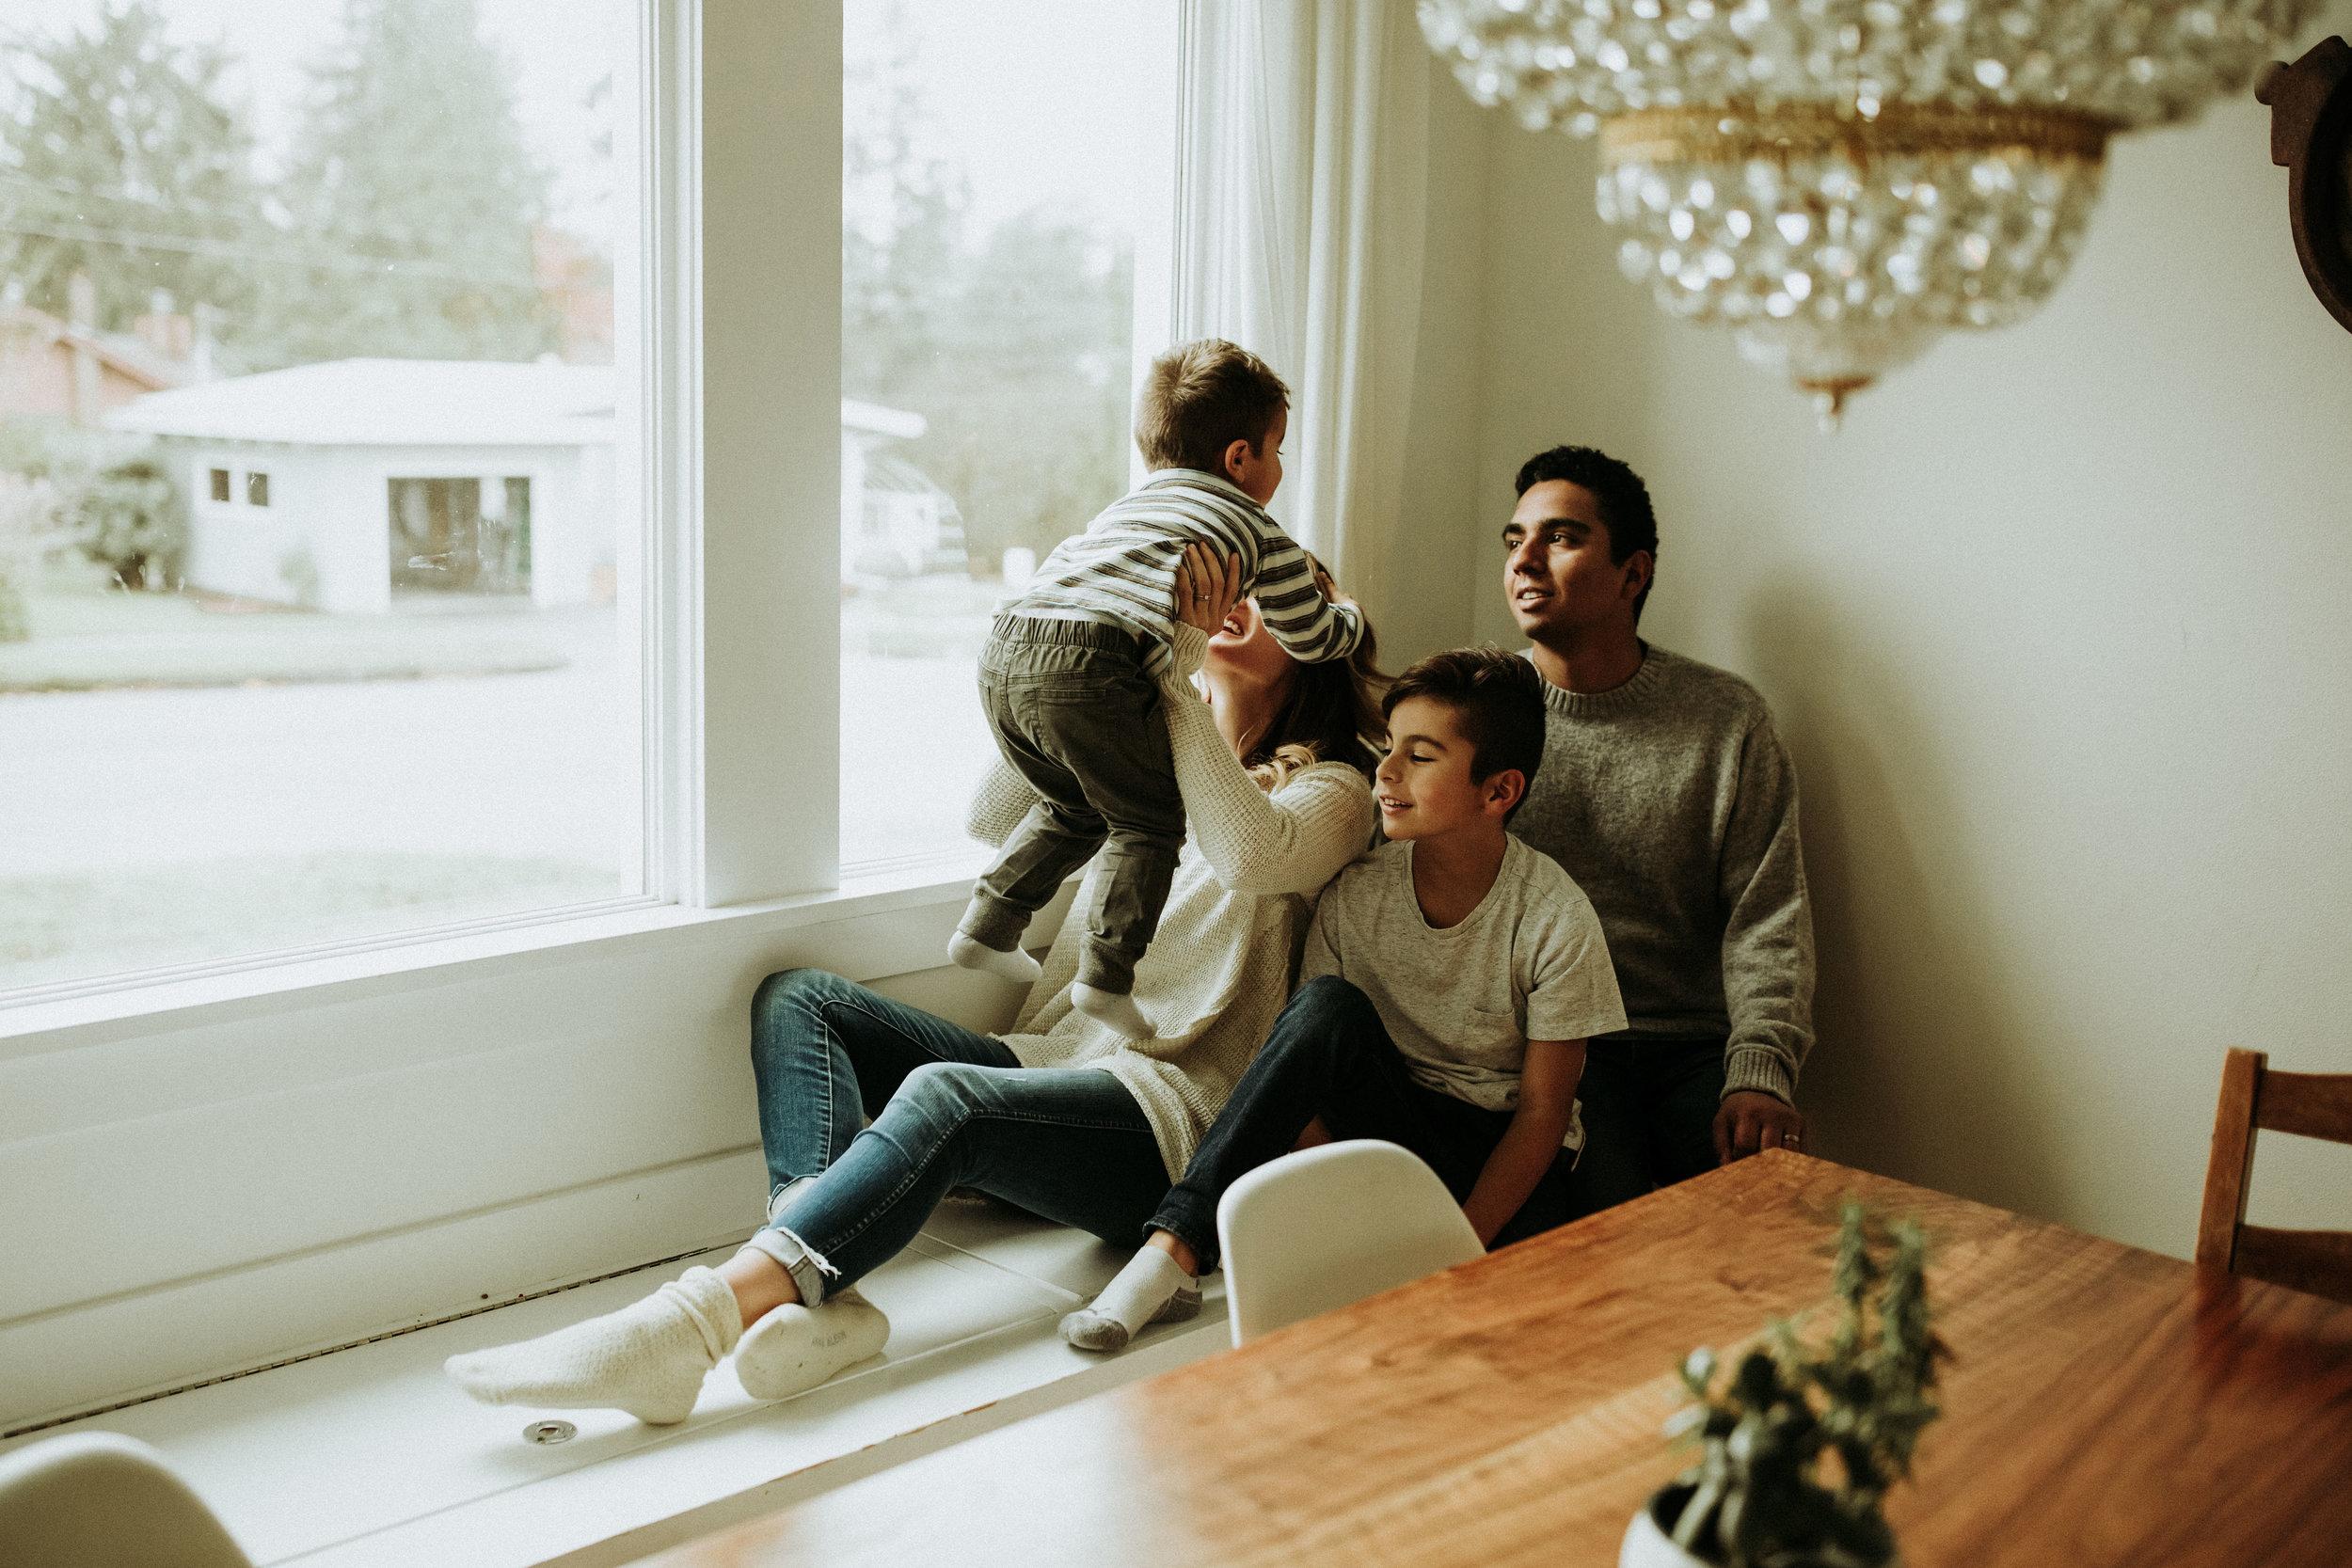 Lifestyle-Photographer-Bellingham-WA-Brianne-Bell-Photography-(Navarrete)-38.jpg